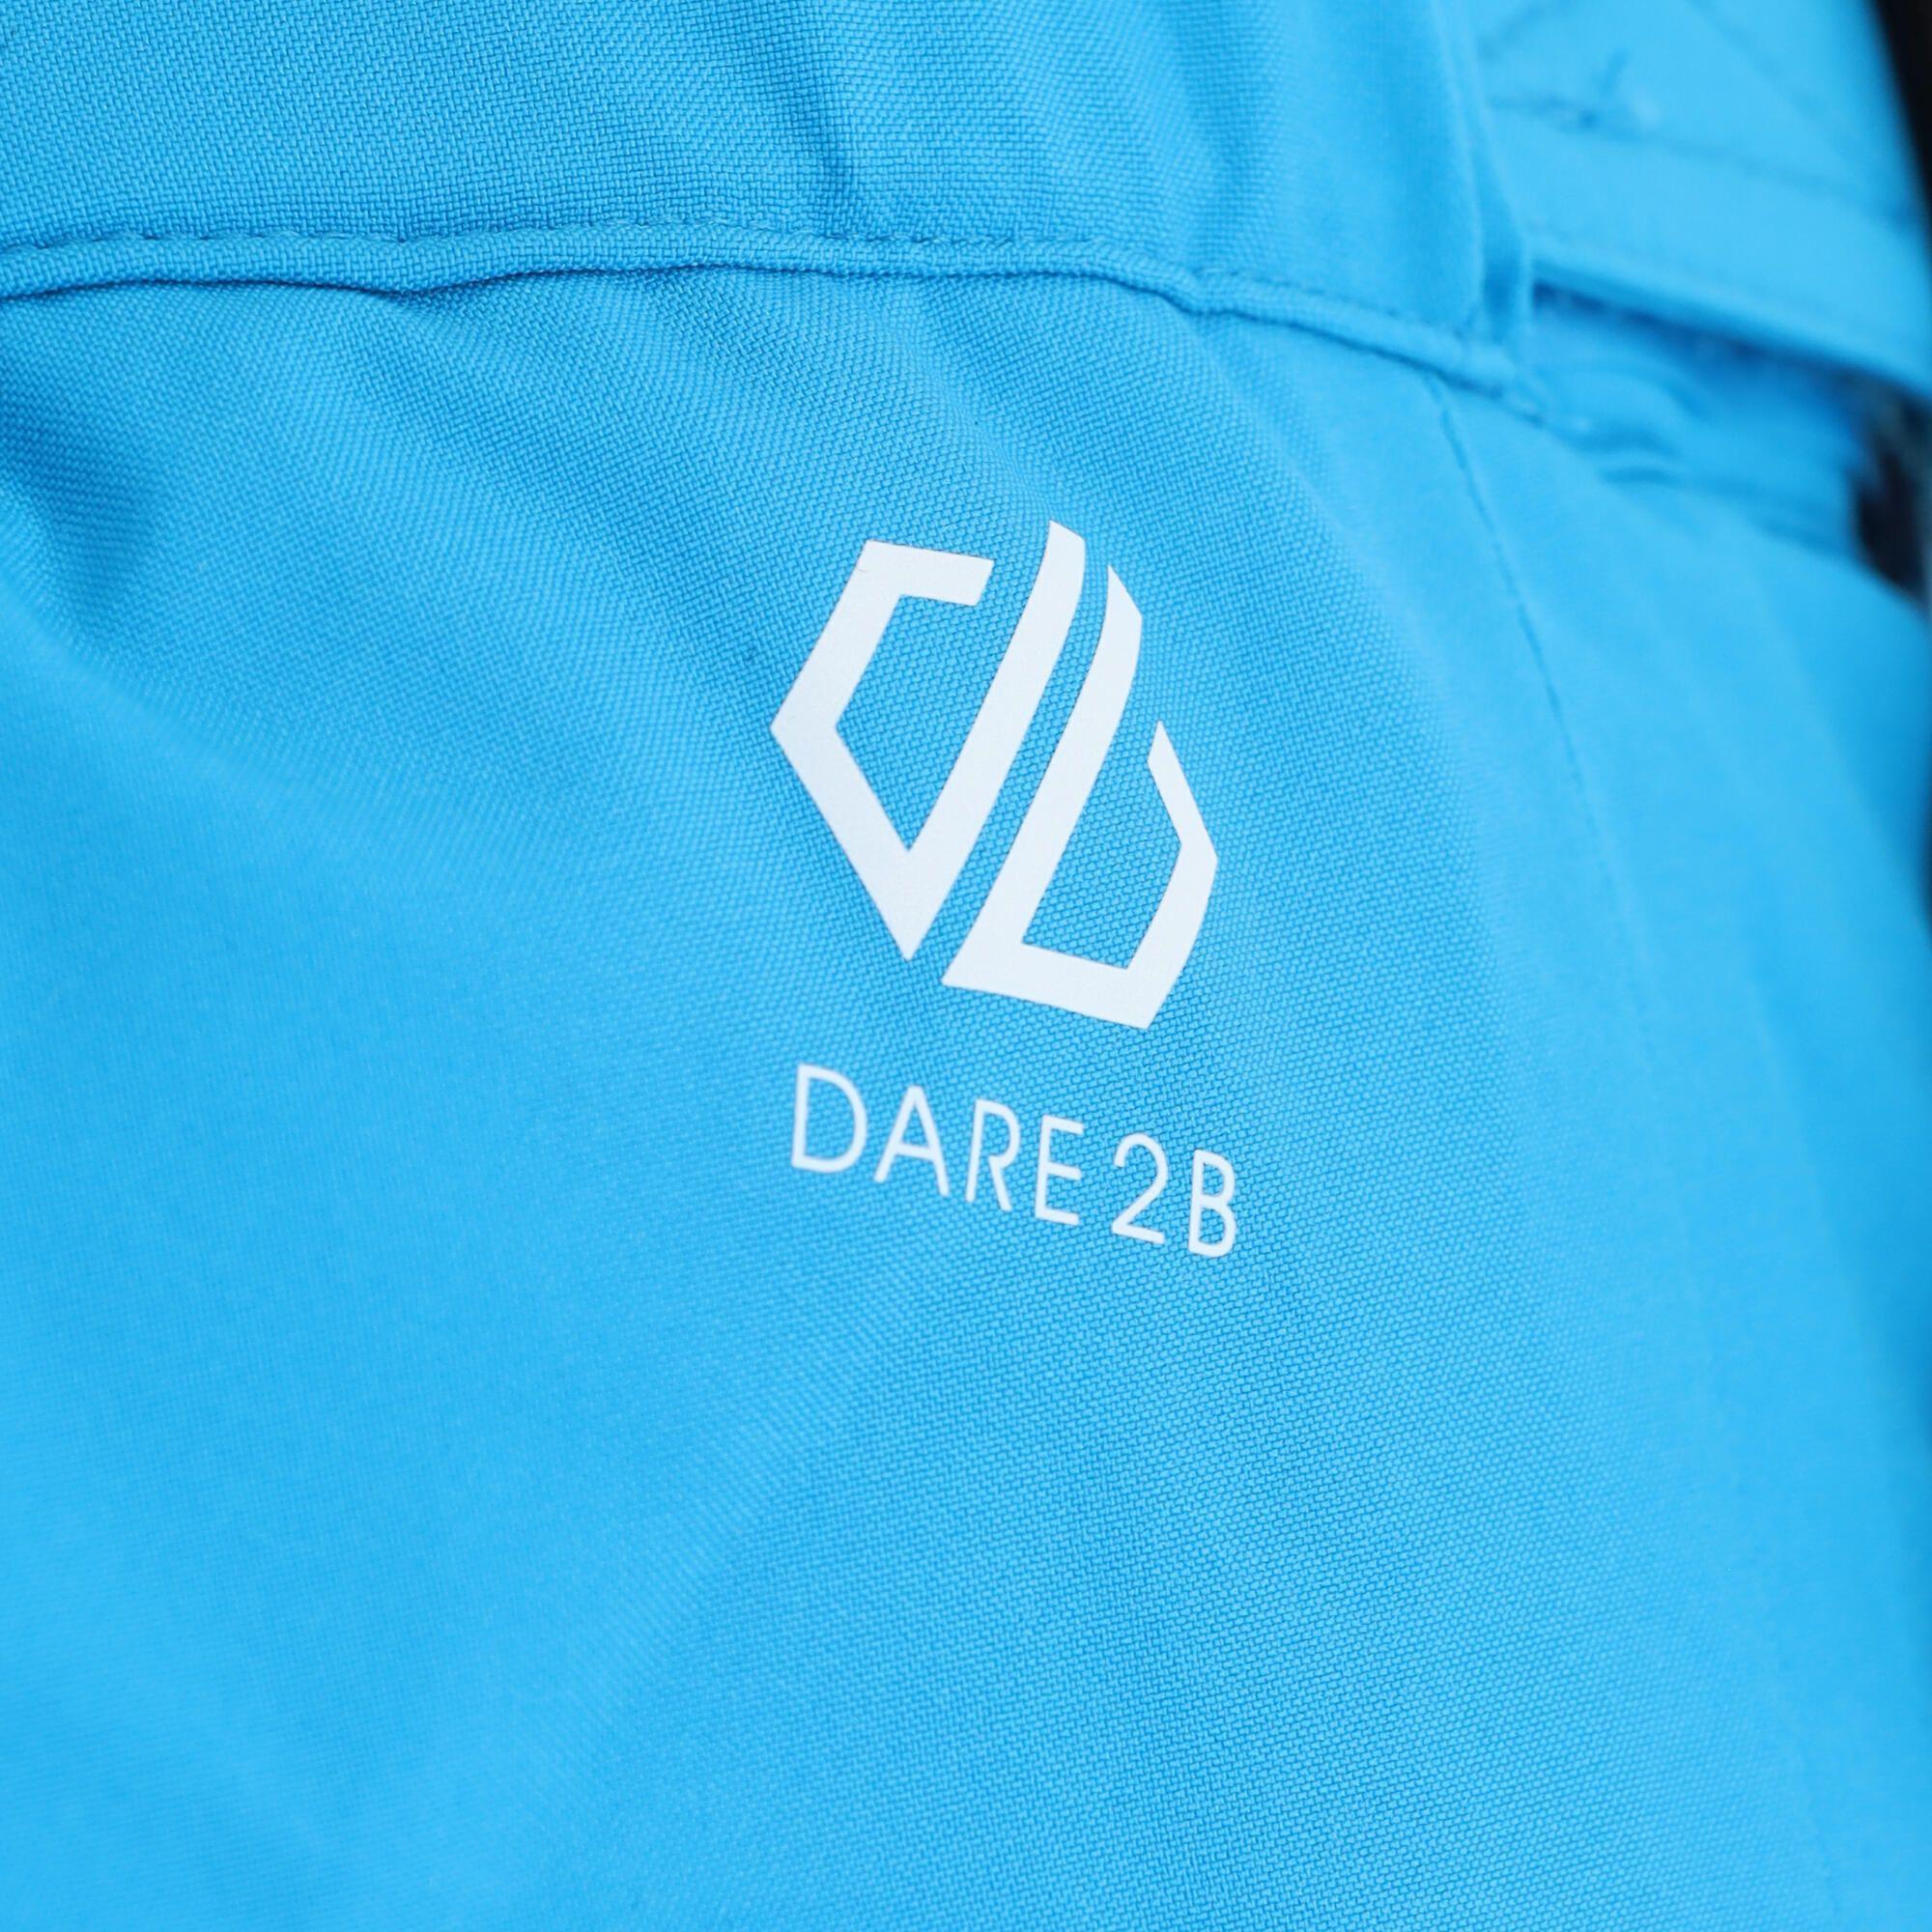 Dare2b, Outmove Ii Pant Skihose Kinder methyl blau